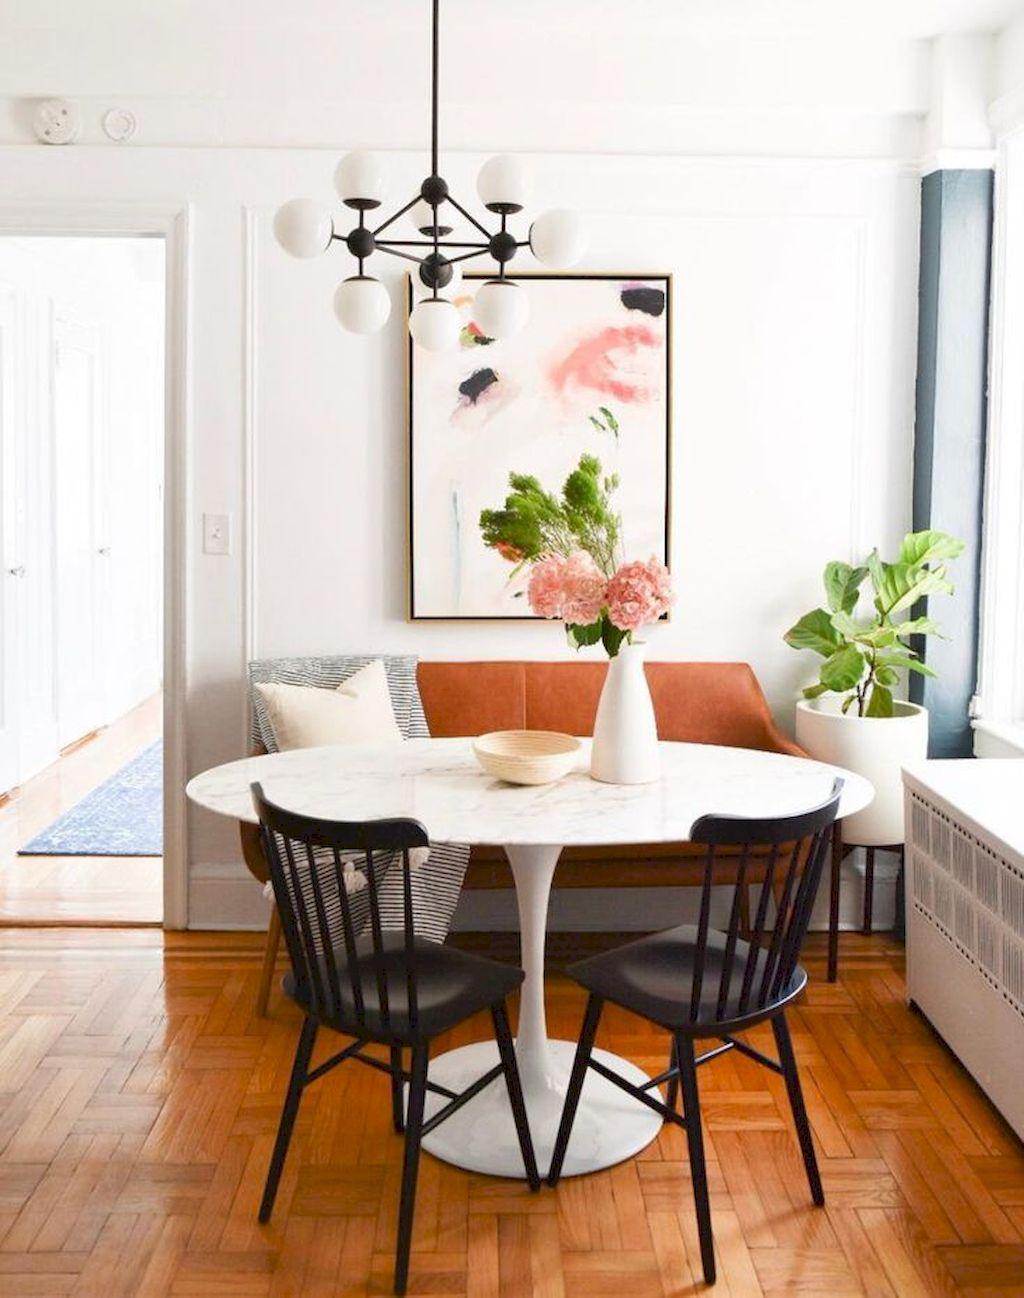 Appartement Diningroom091